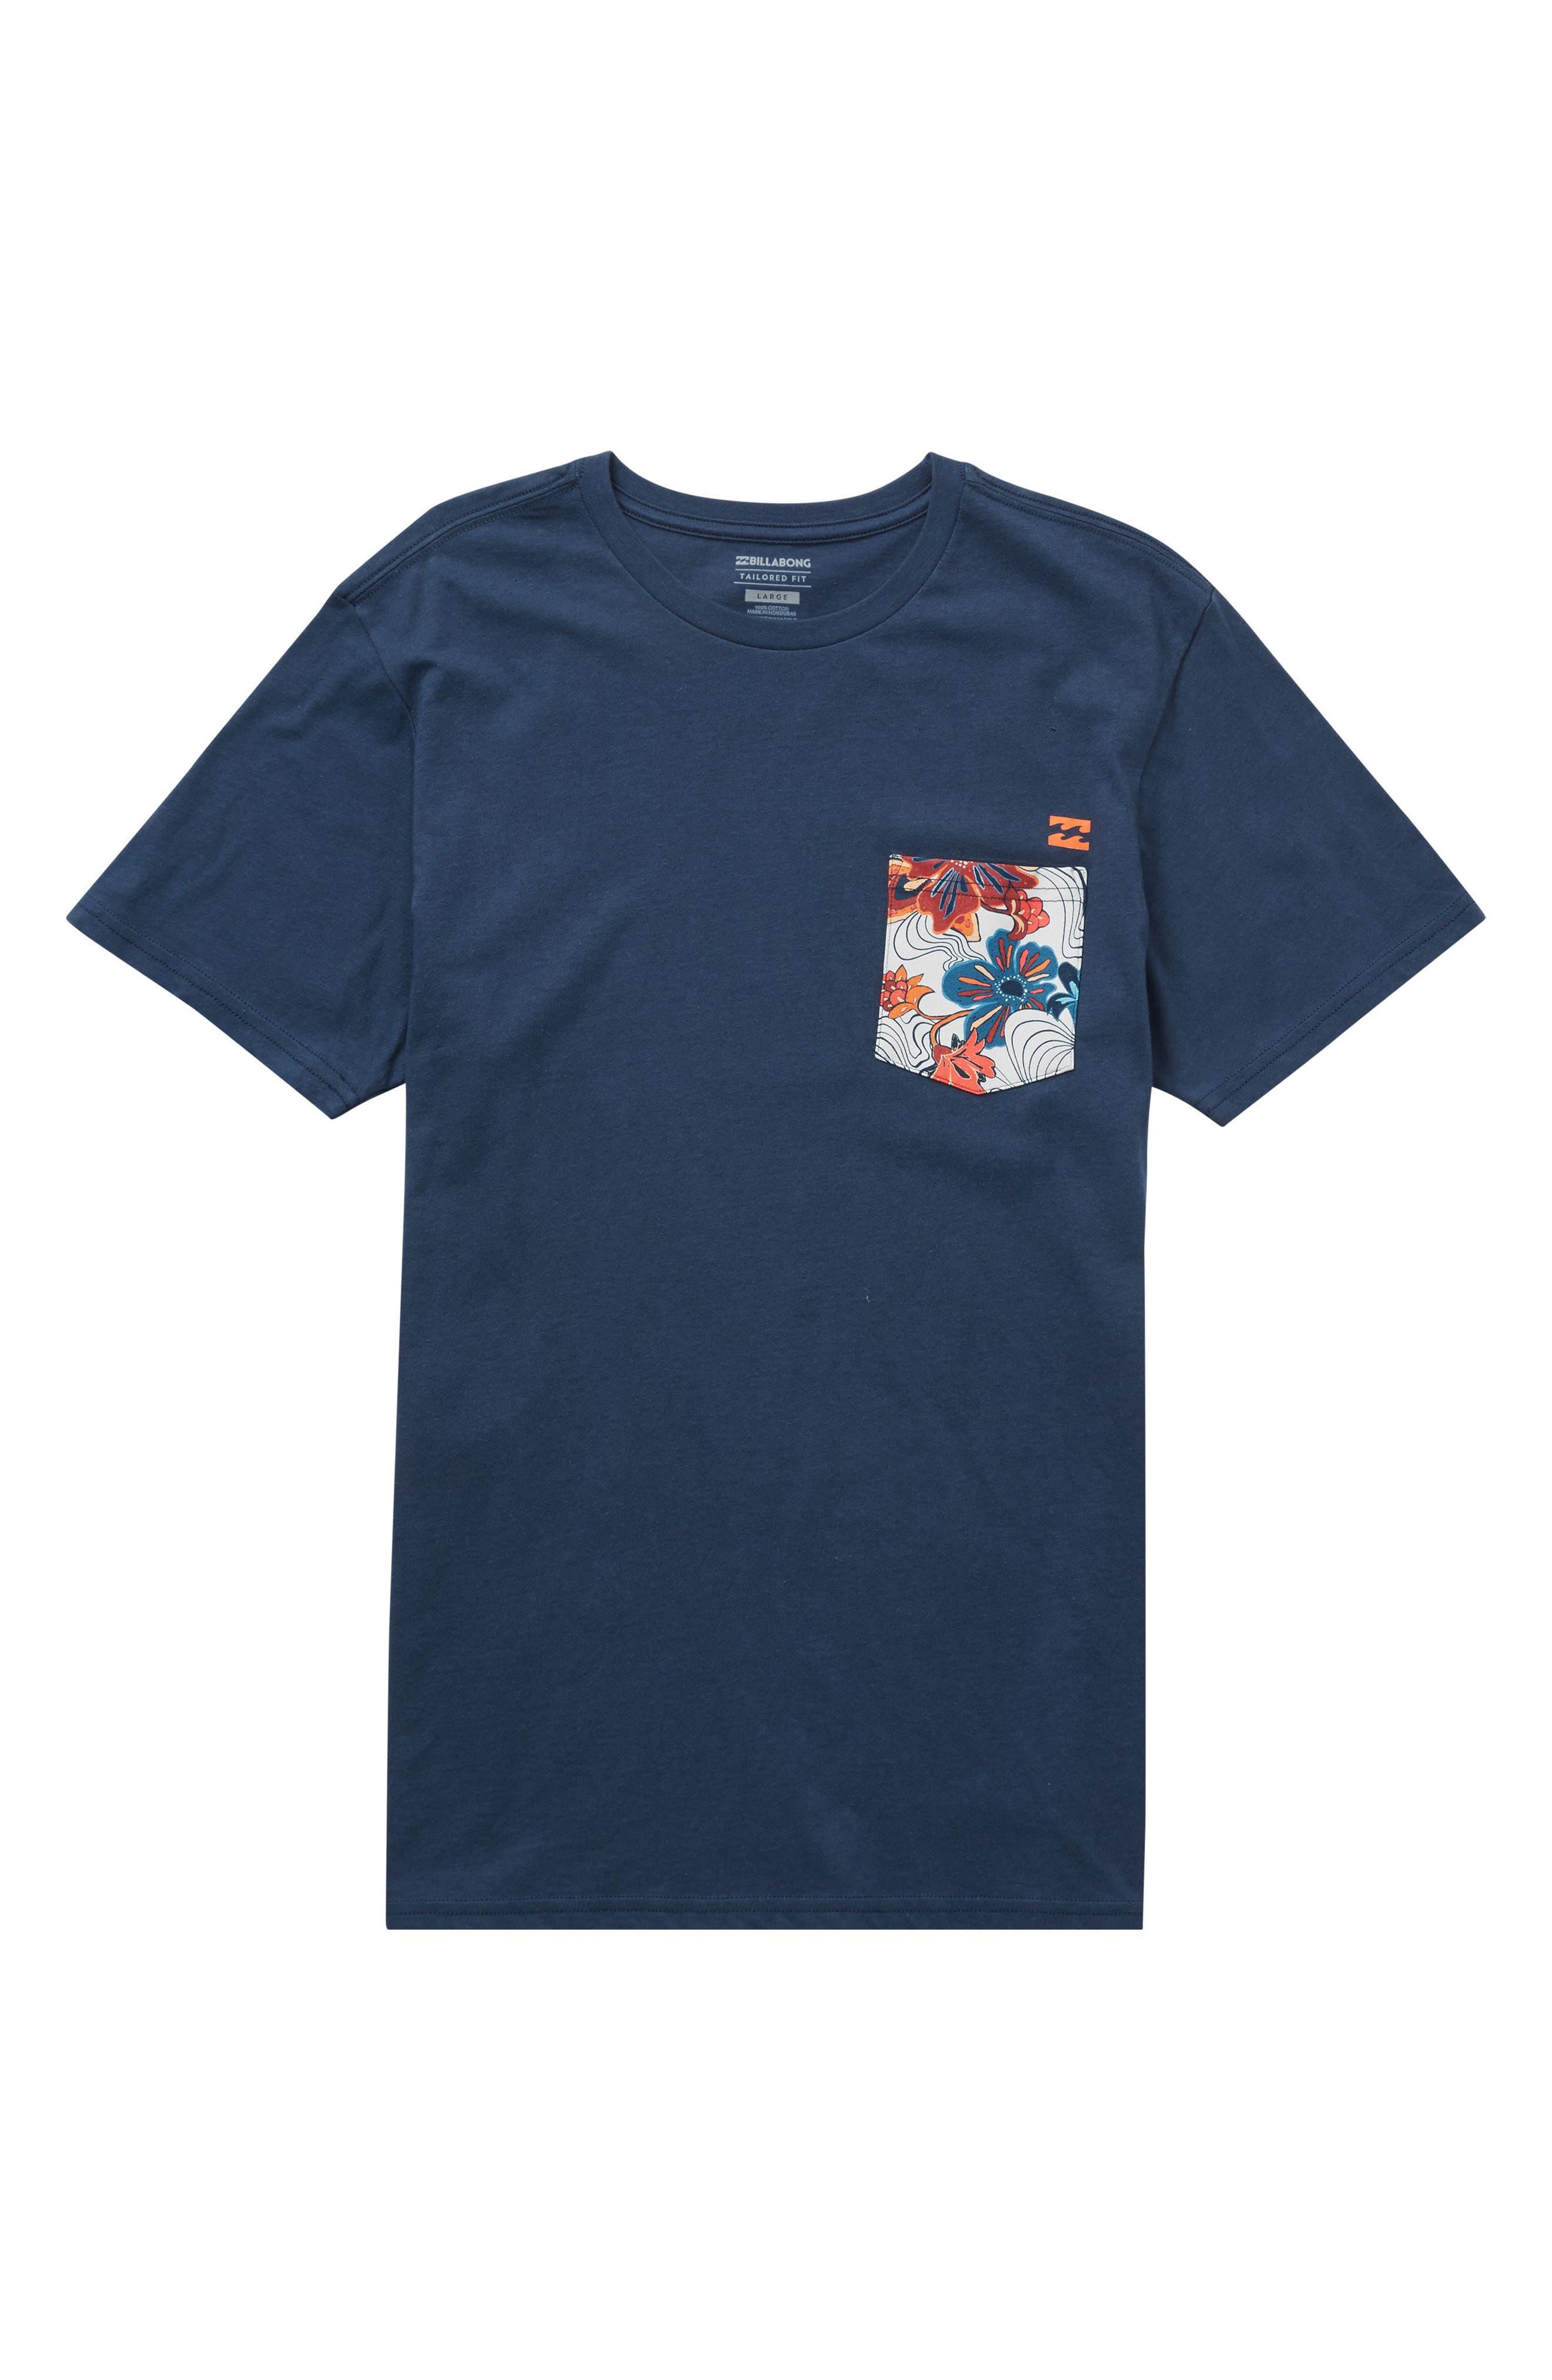 Billabong Team Pocket T-Shirt (Big Boys)